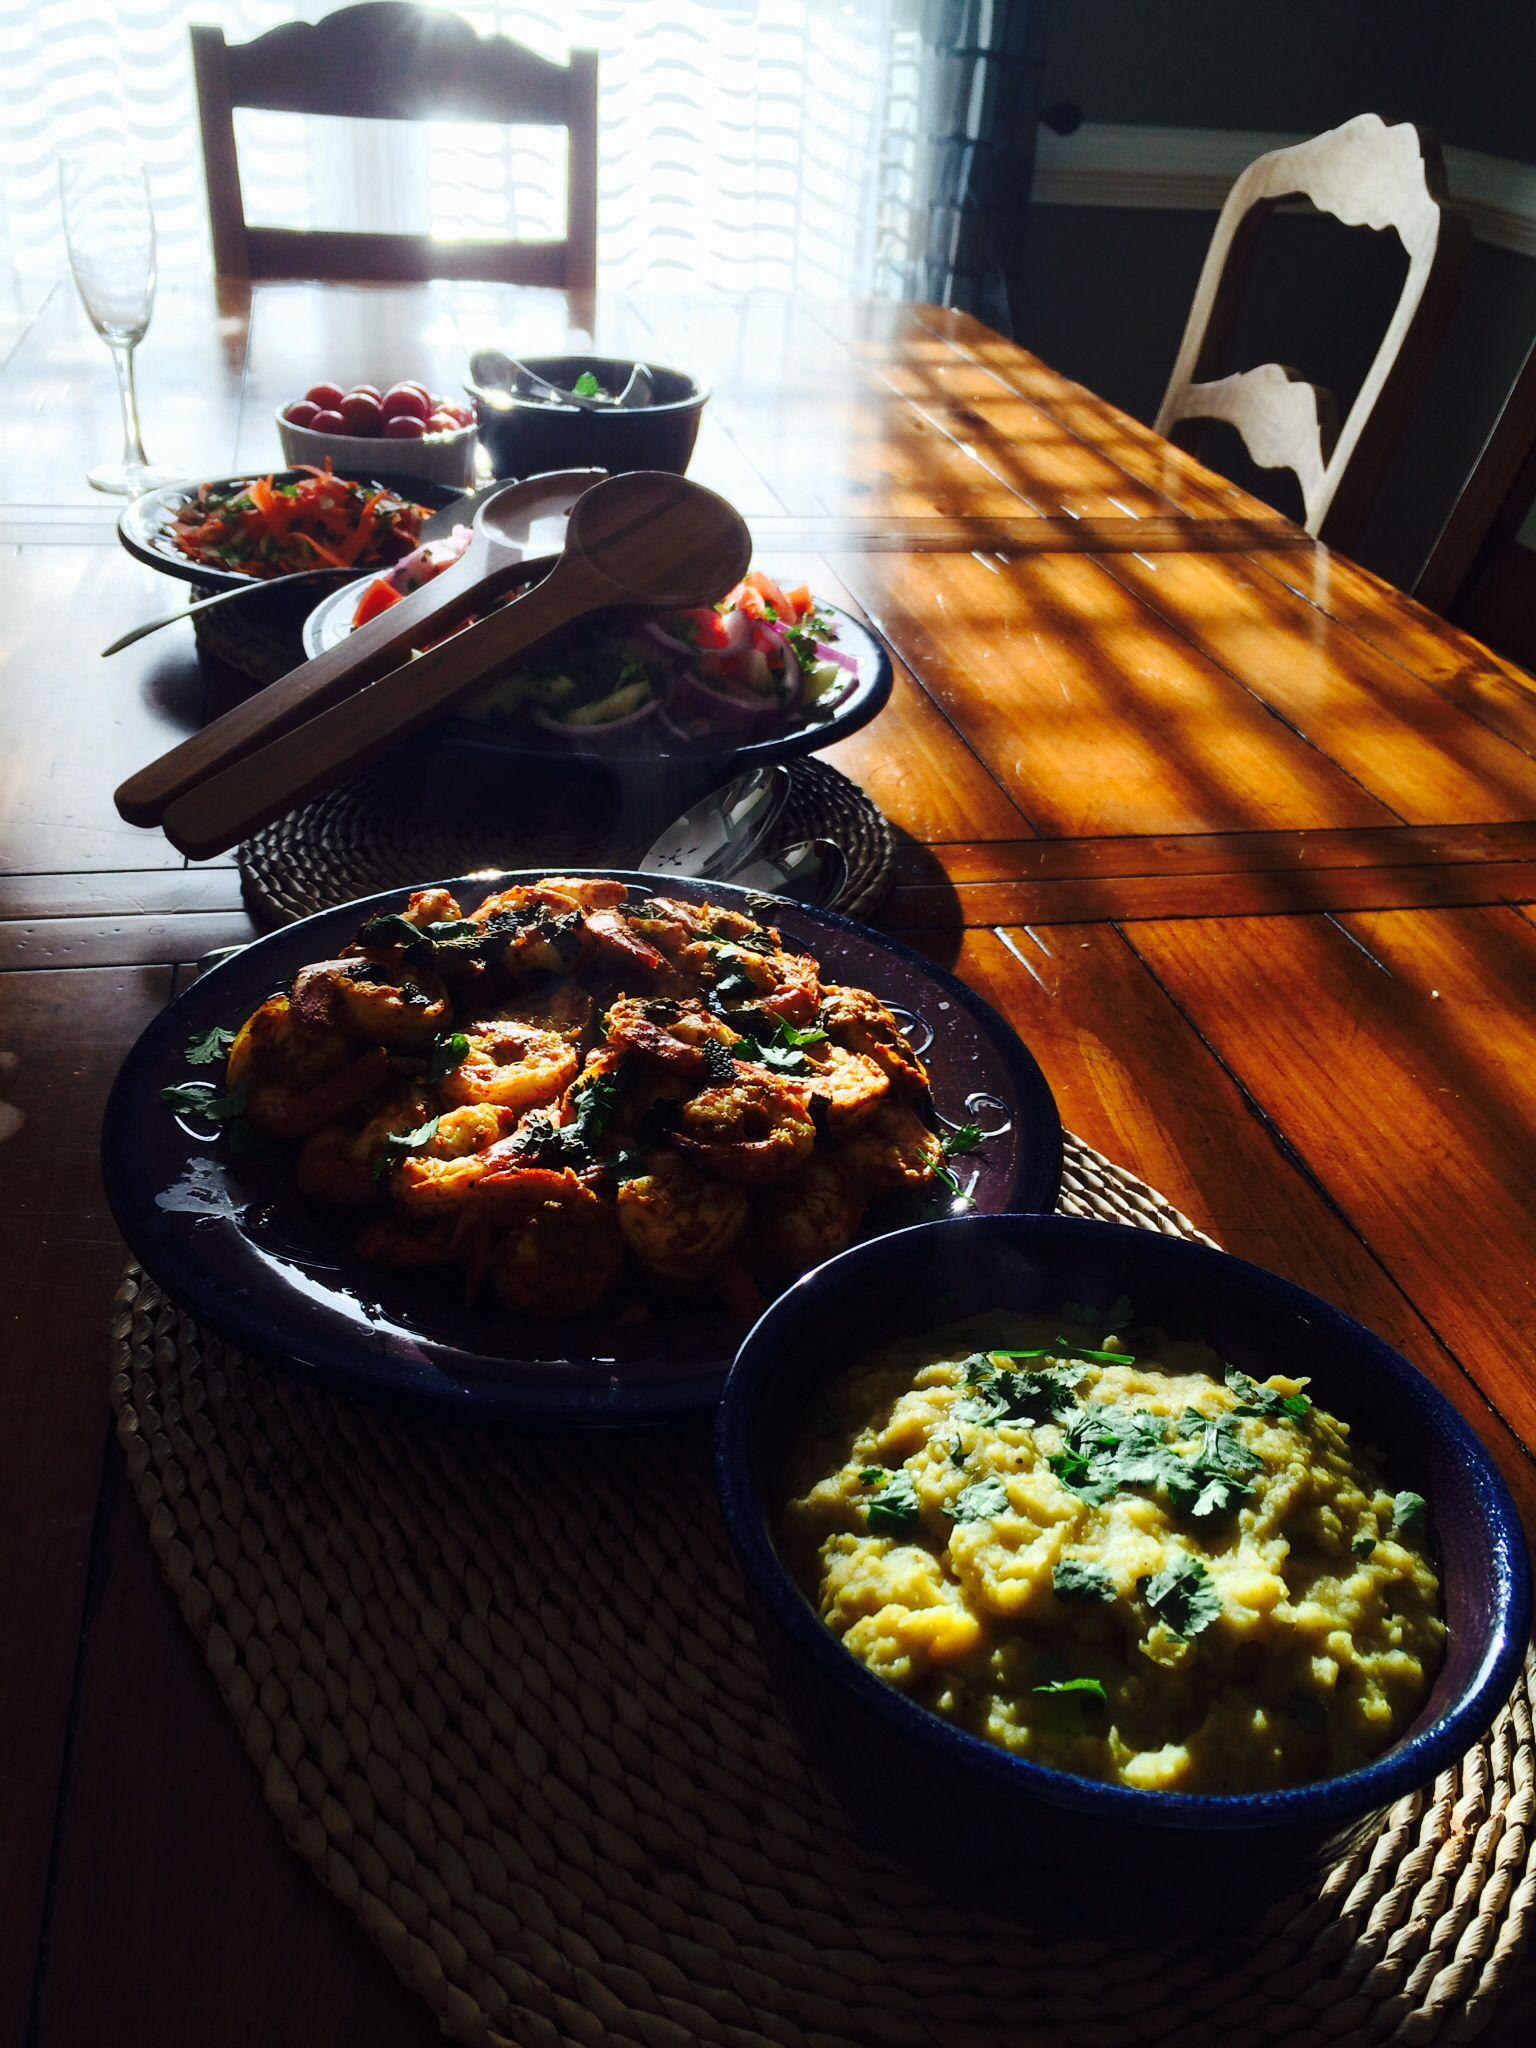 Masala prawns, lentil Dhal, and salad accompaniments